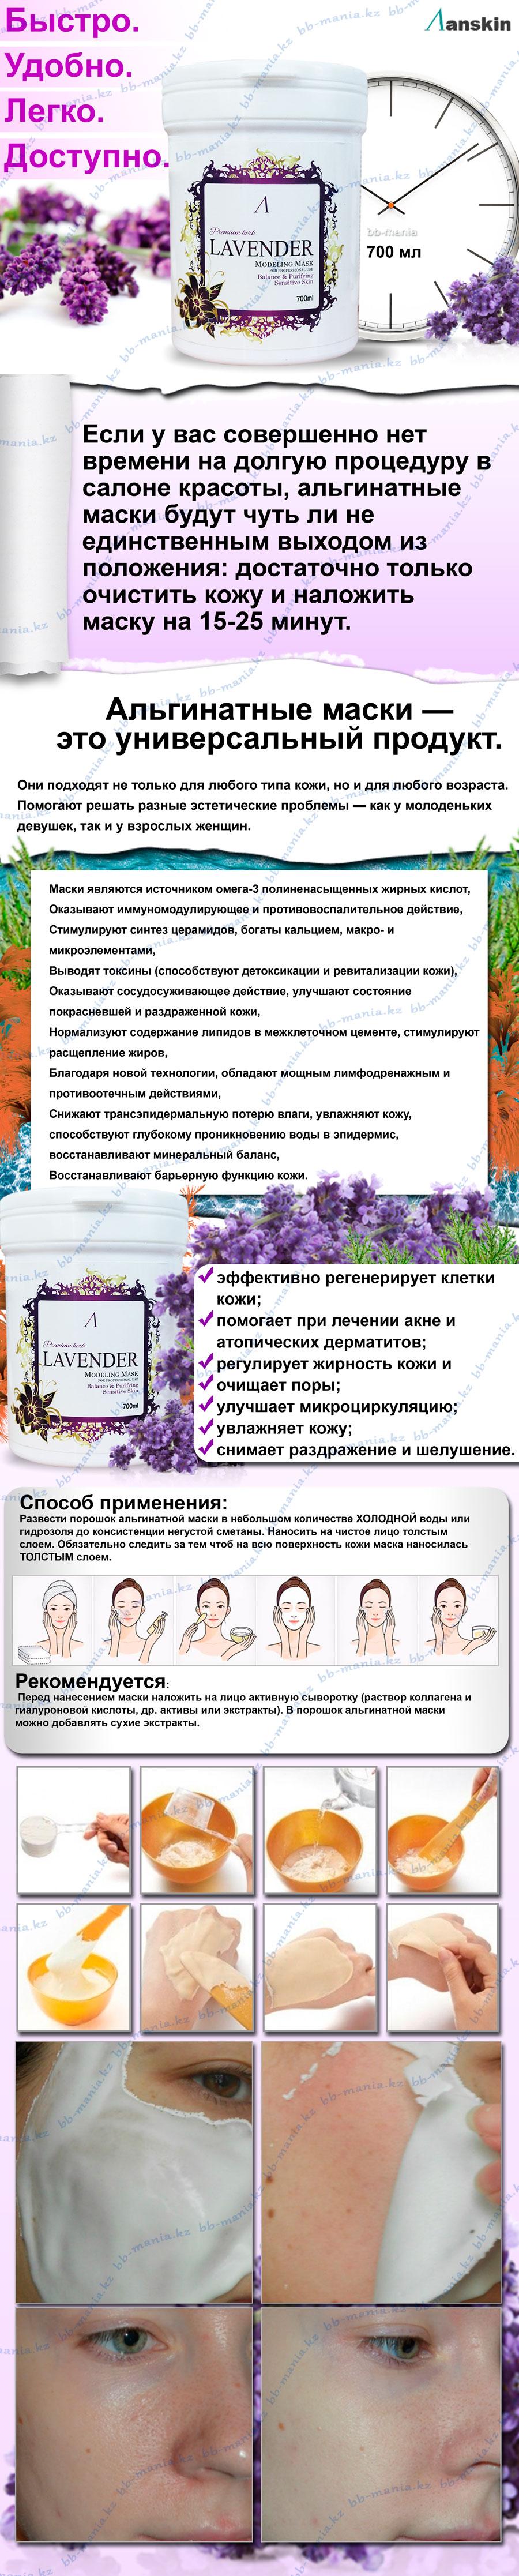 Lavender-min